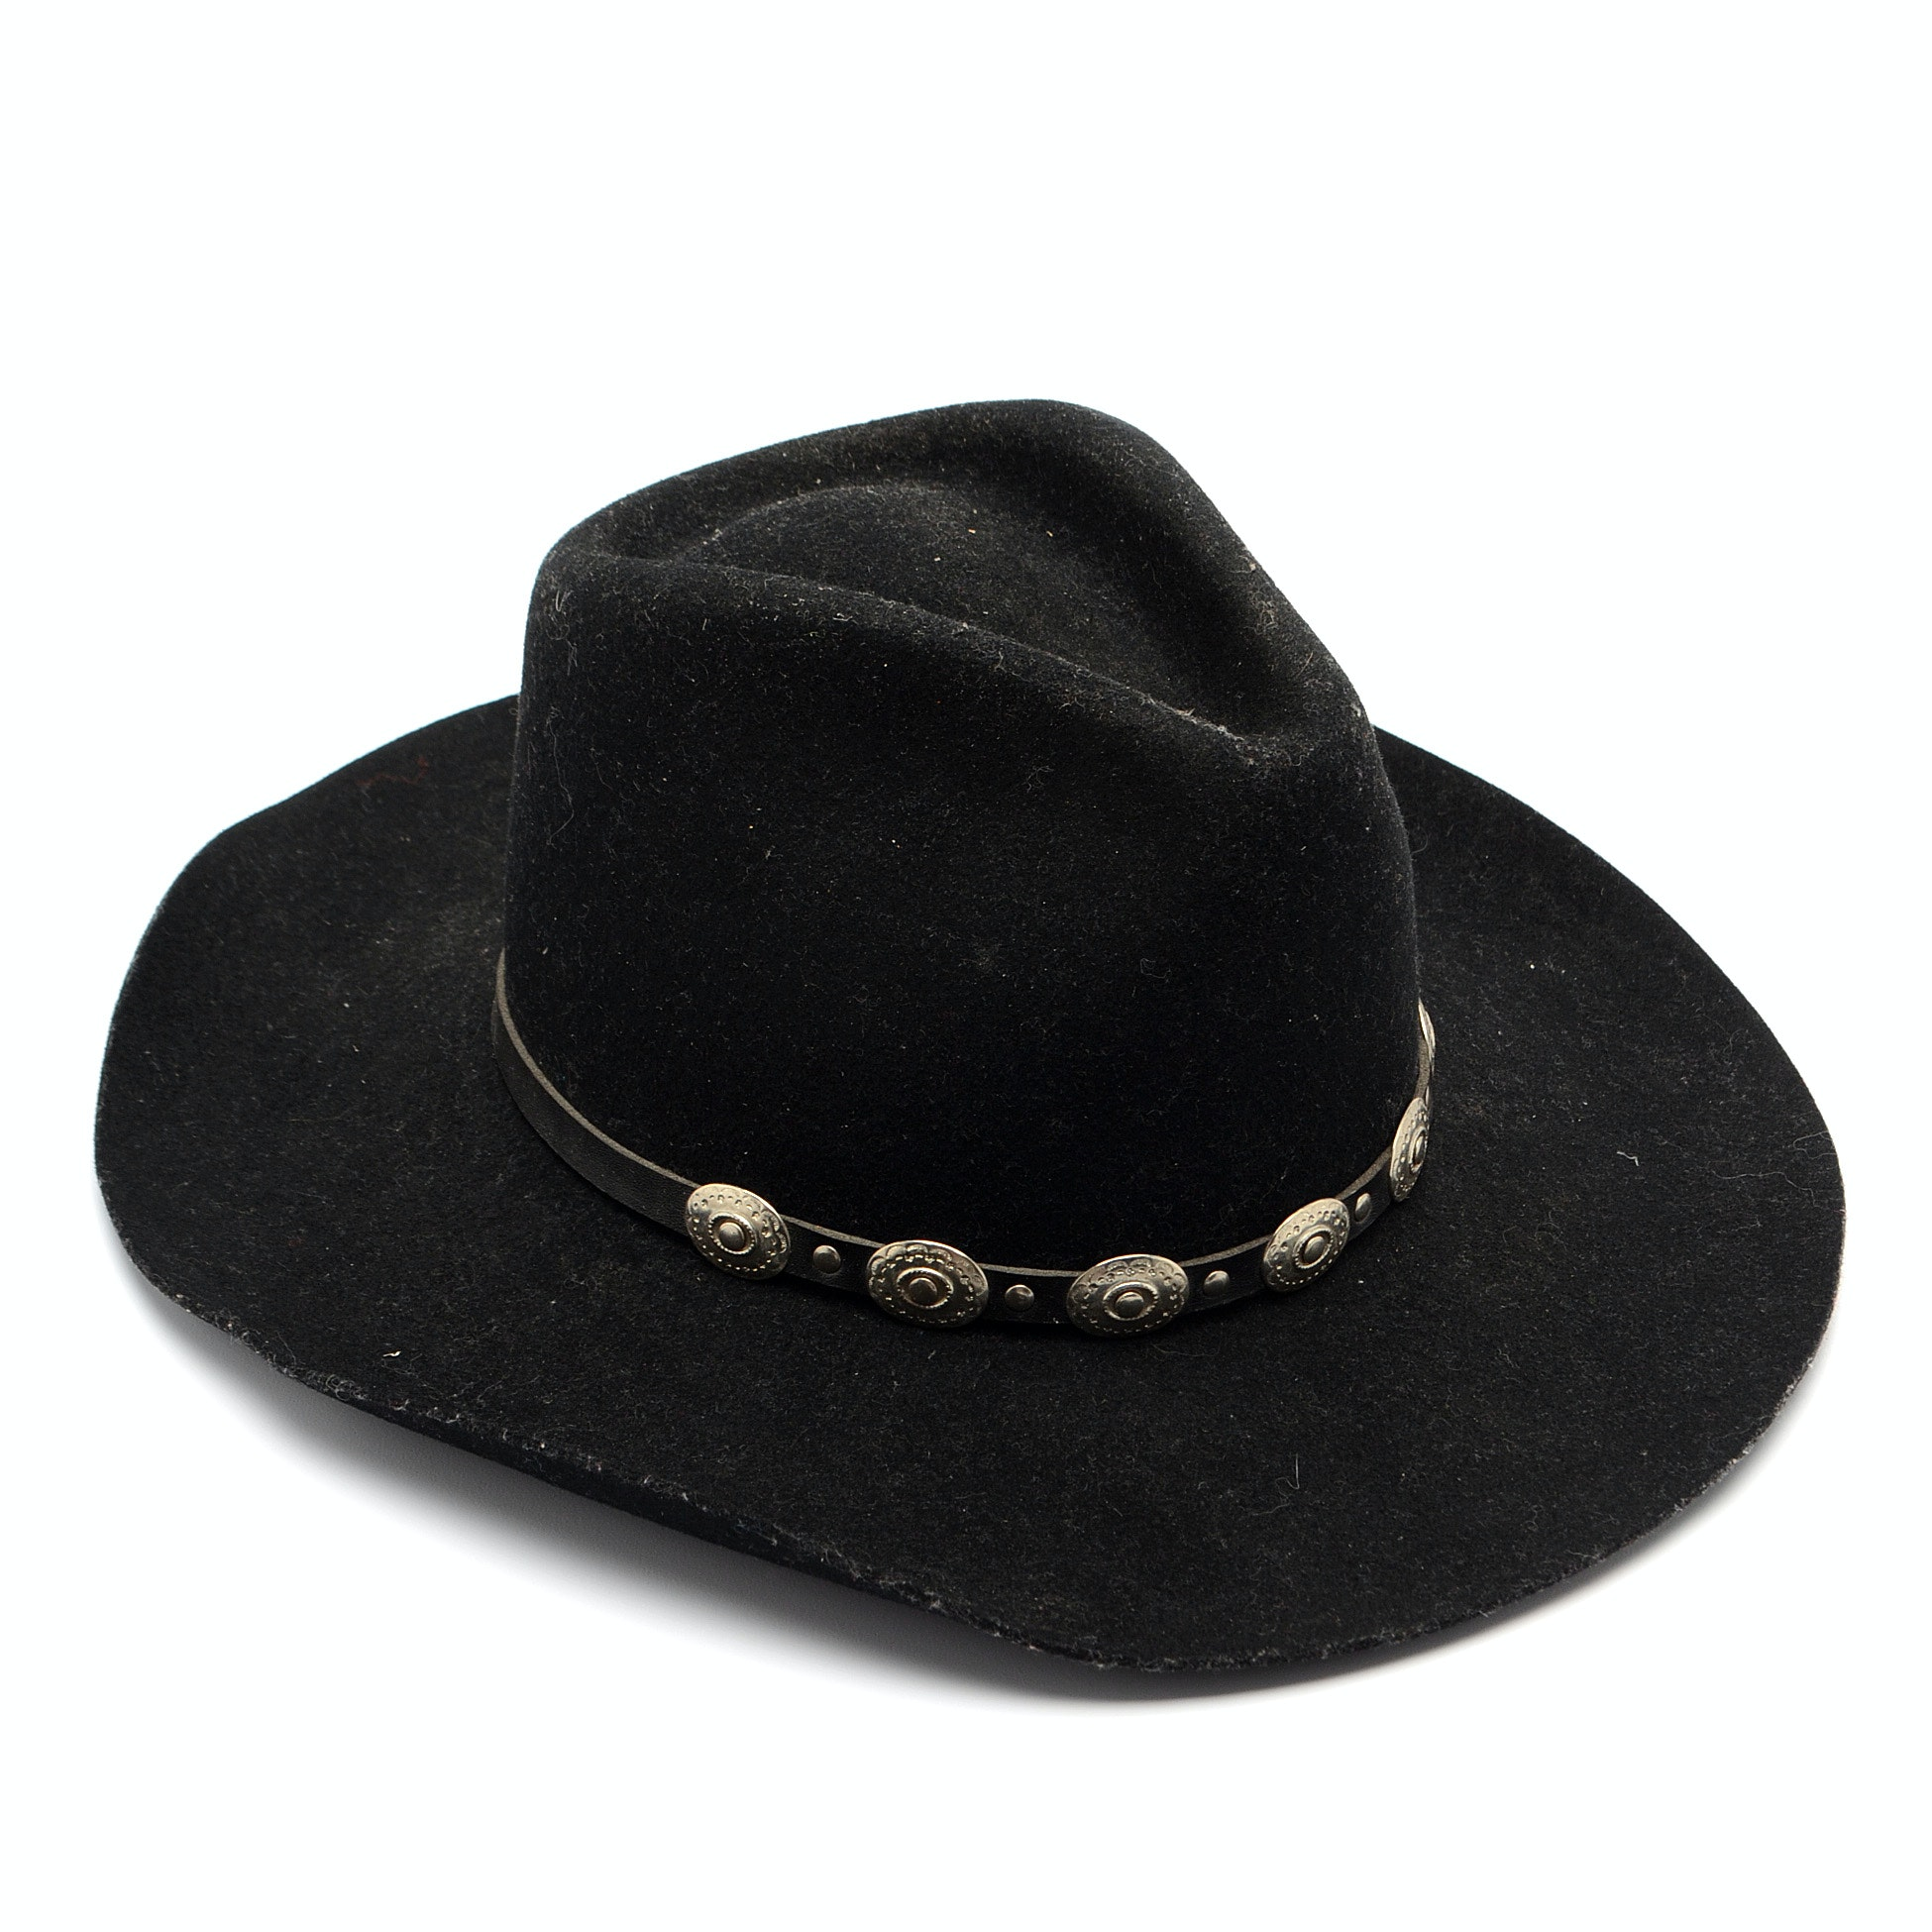 Vintage Stetson Stallion Black Wool Felted Cowboy Hat